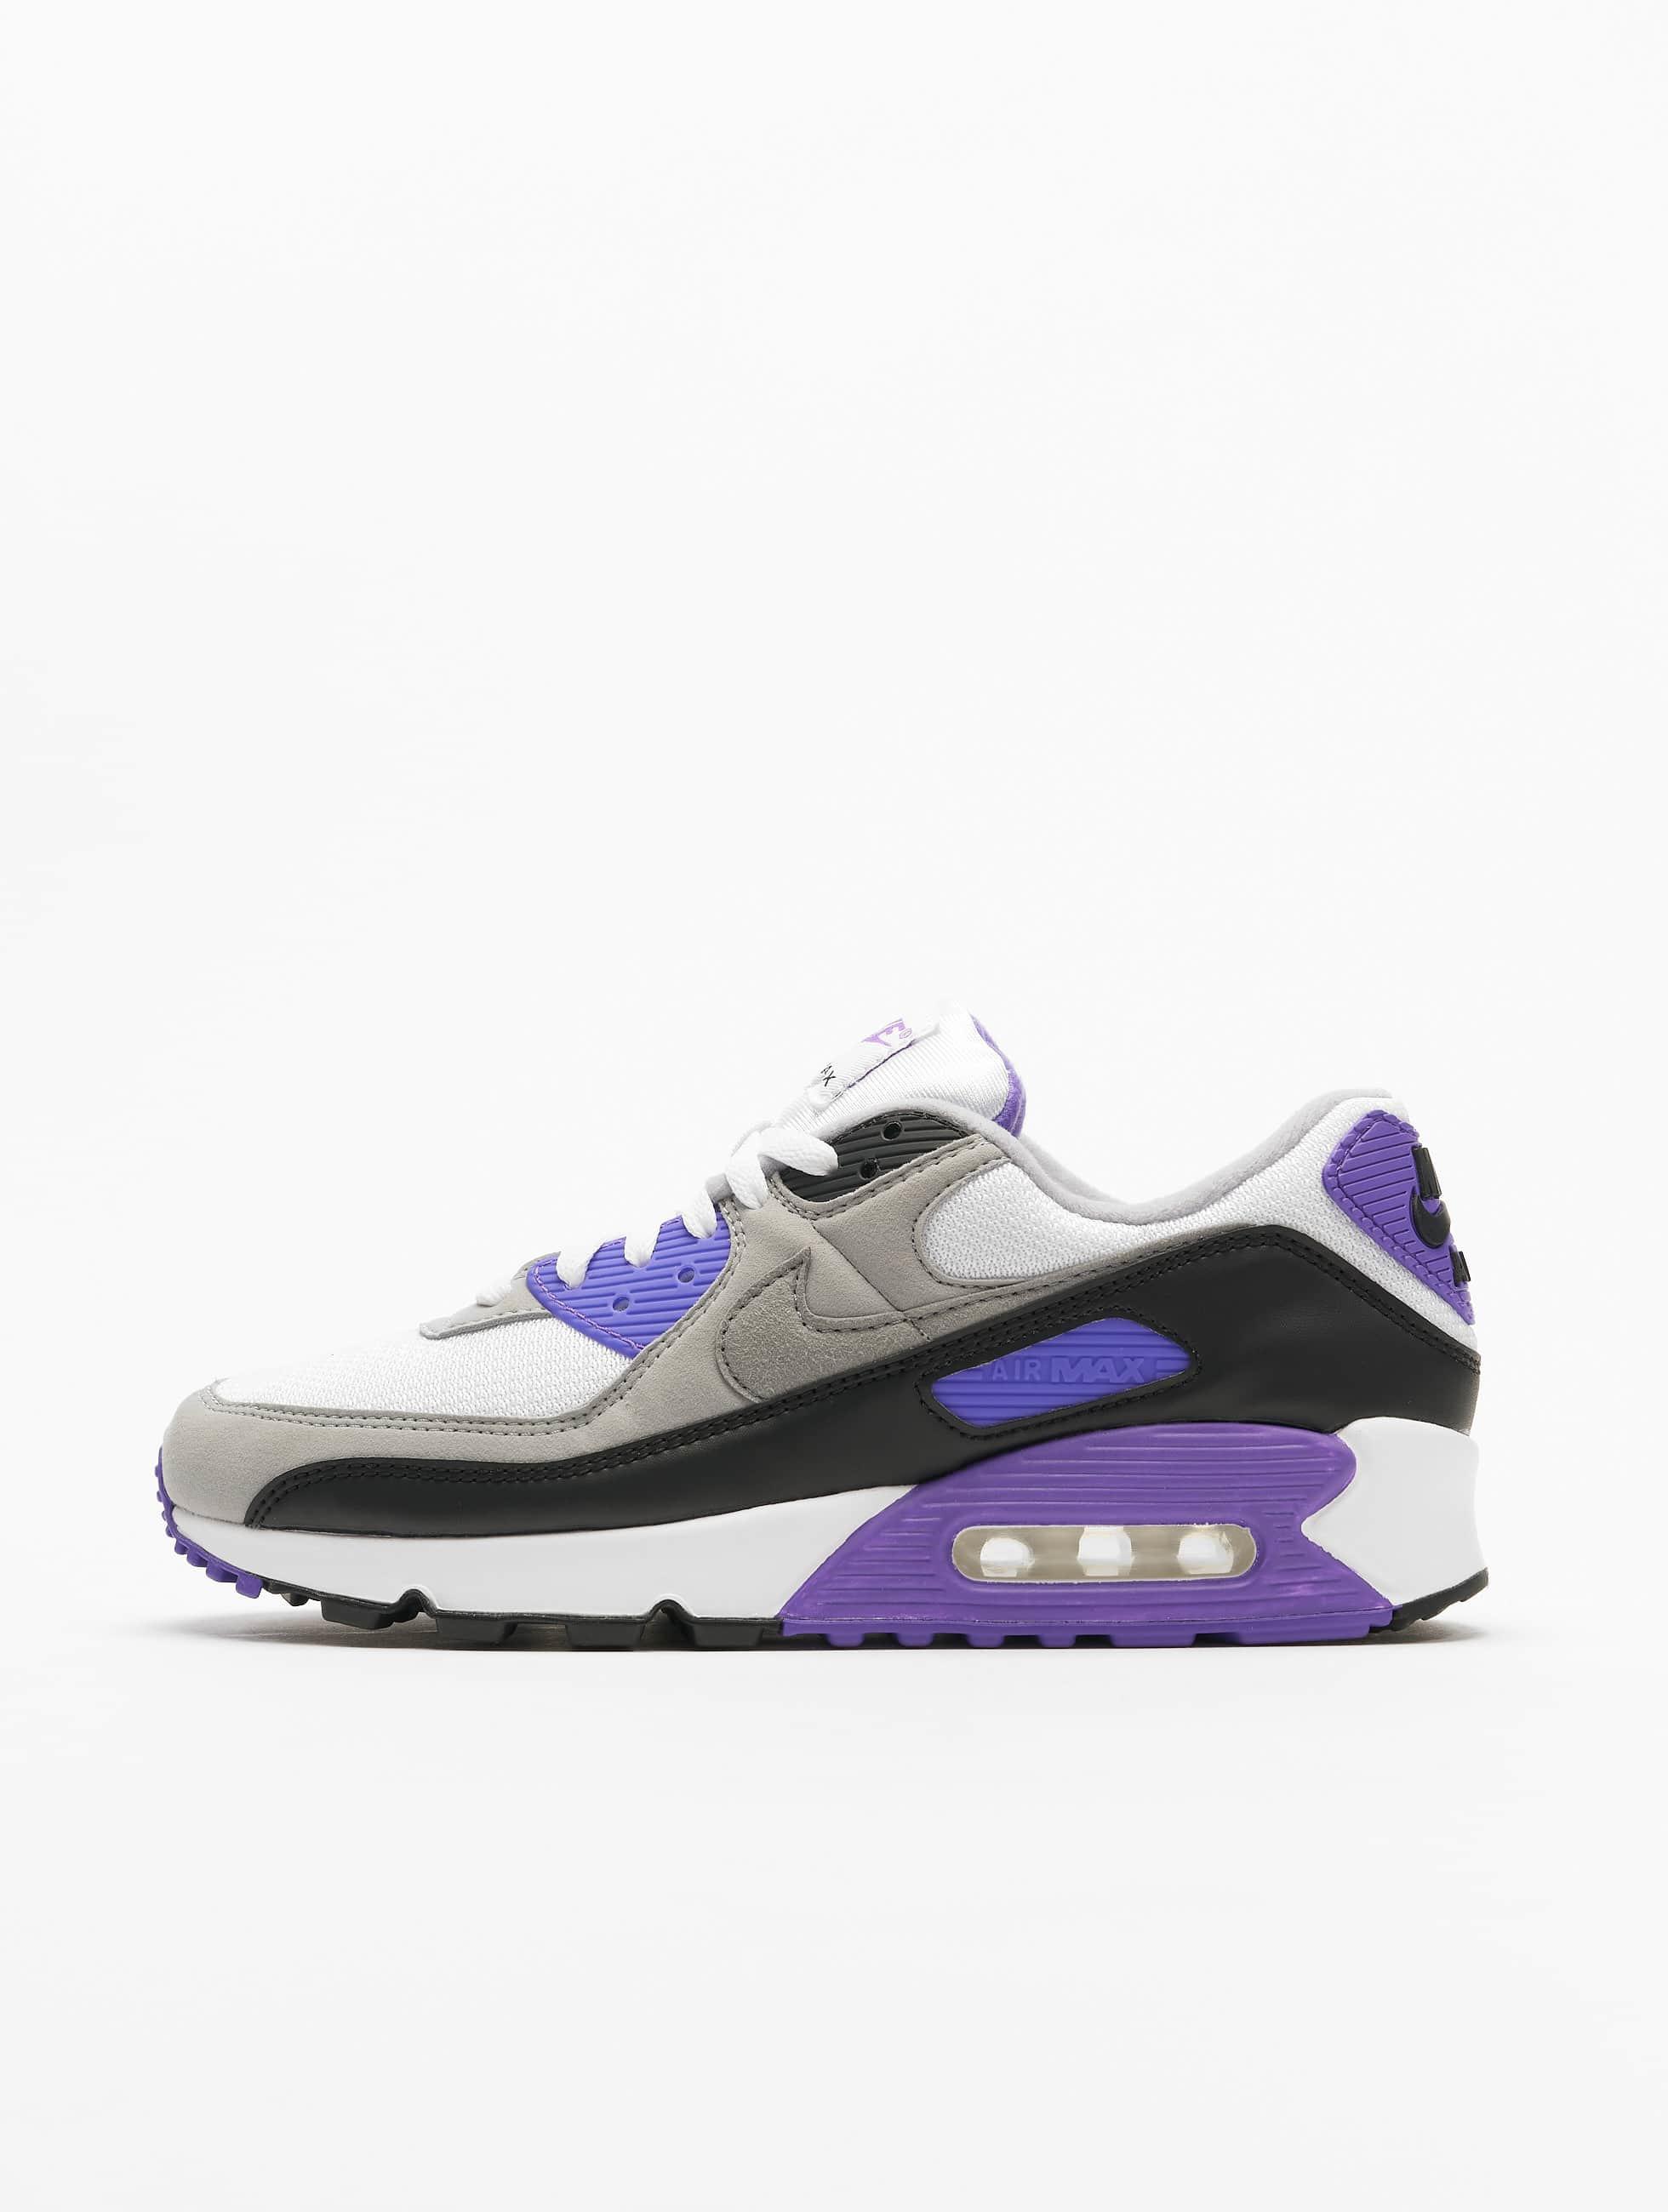 Nike Air Max 90 Sneakers WhiteParticle GreyHyper GrapeBlack